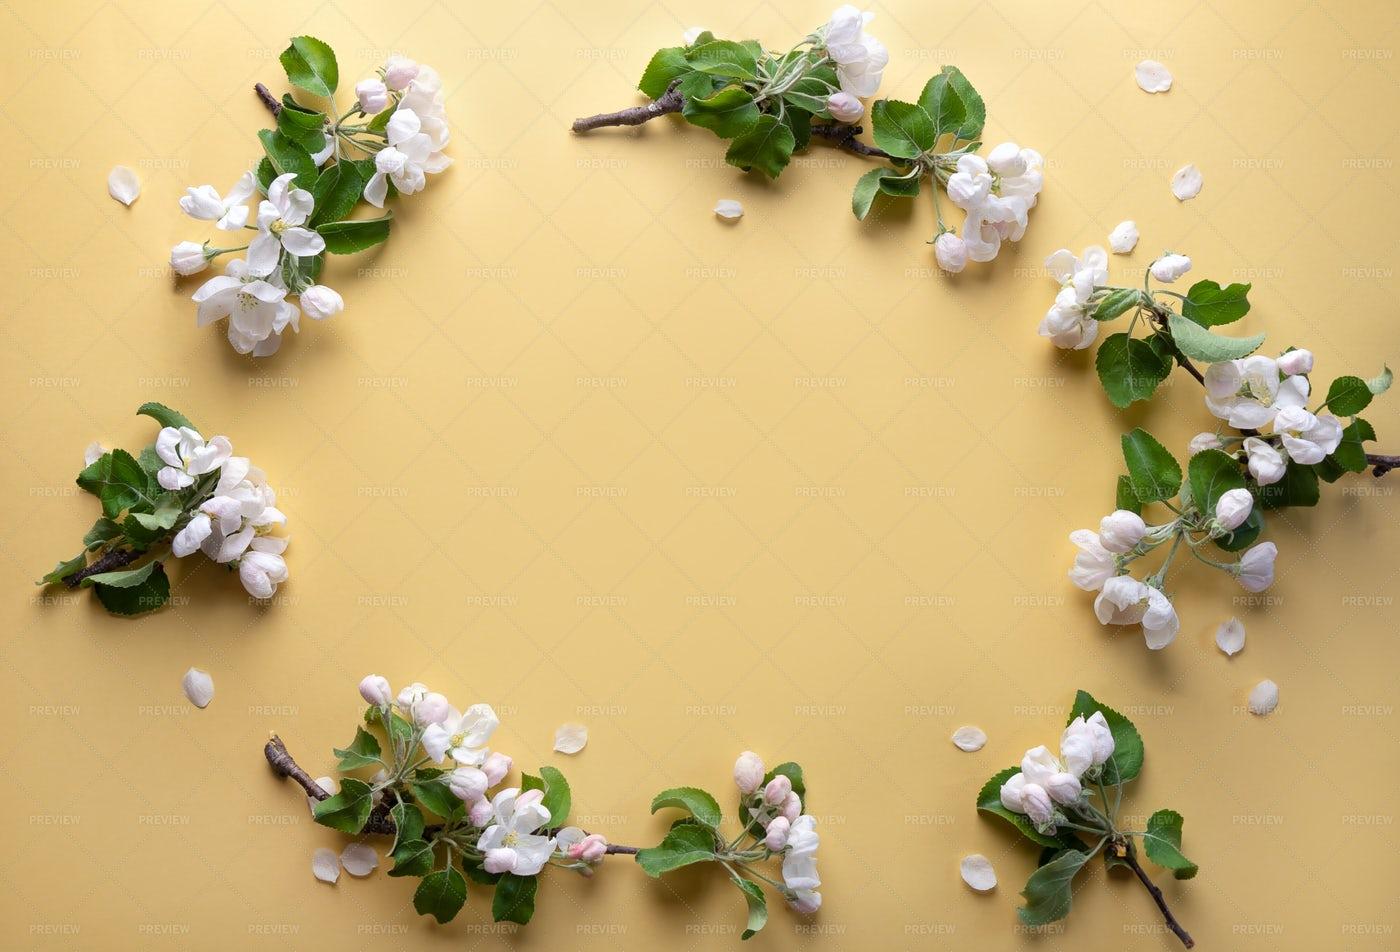 Frame Of Flowers: Stock Photos